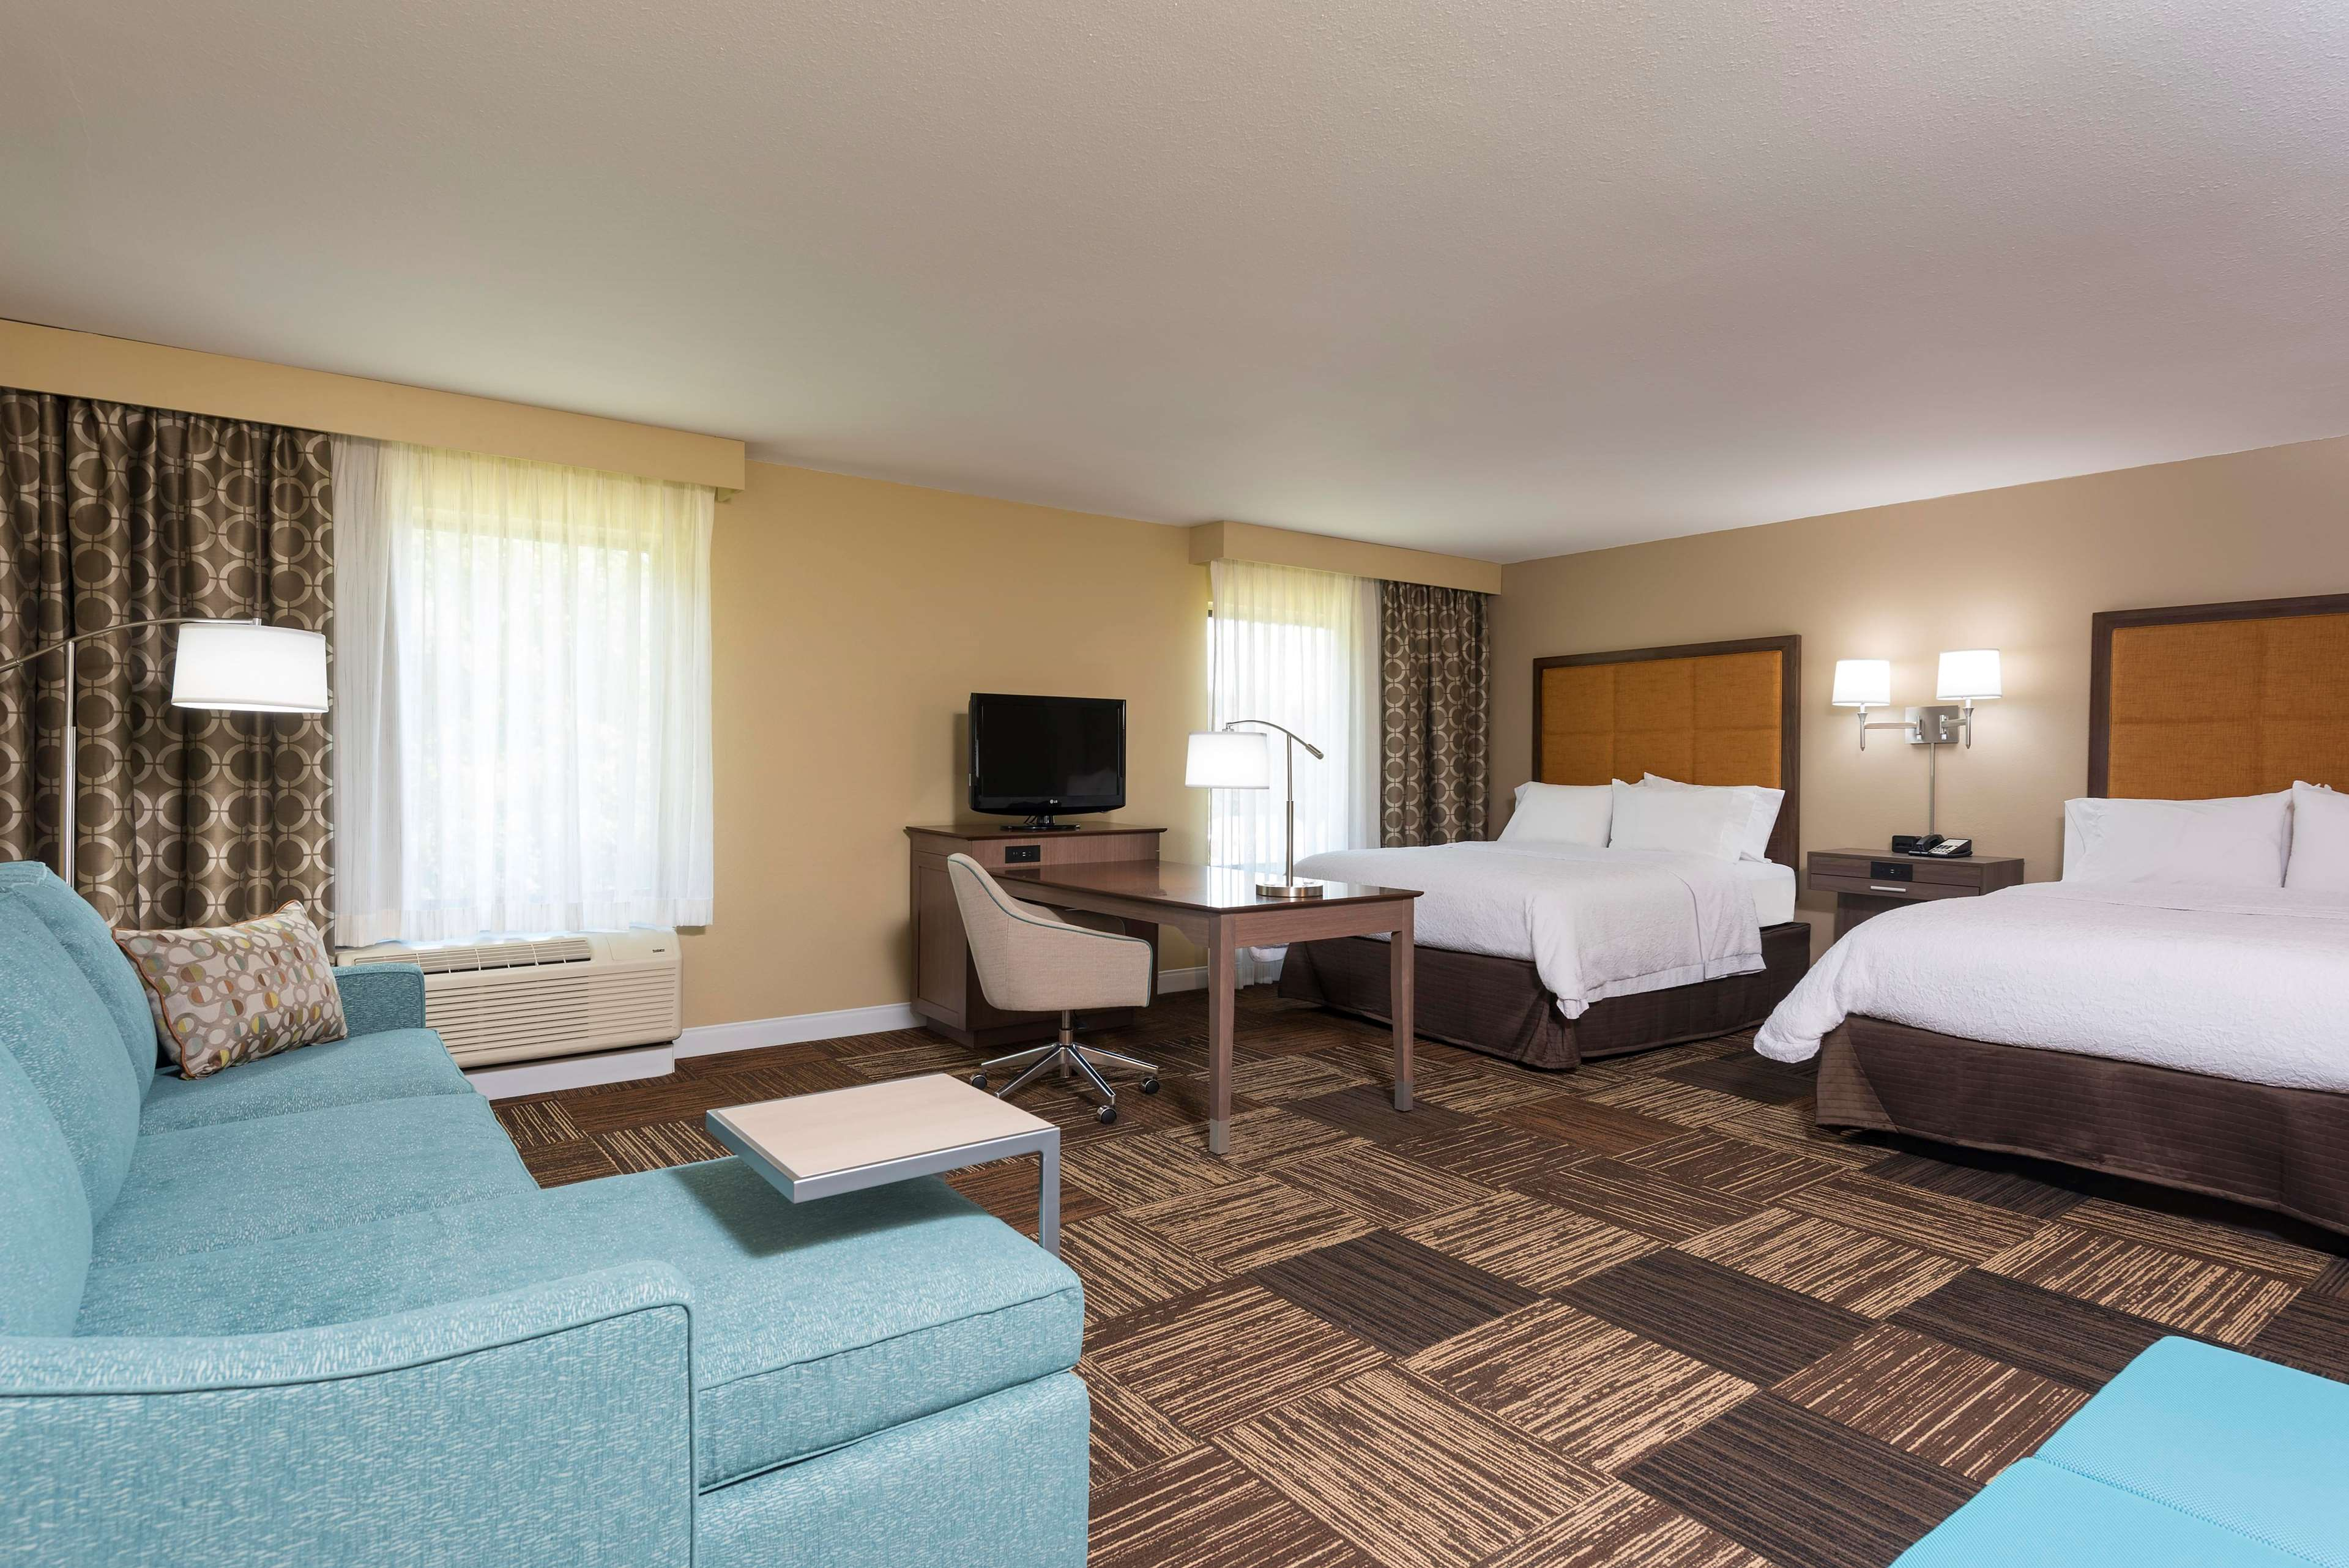 Hampton Inn & Suites Mansfield-South @ I-71 image 9